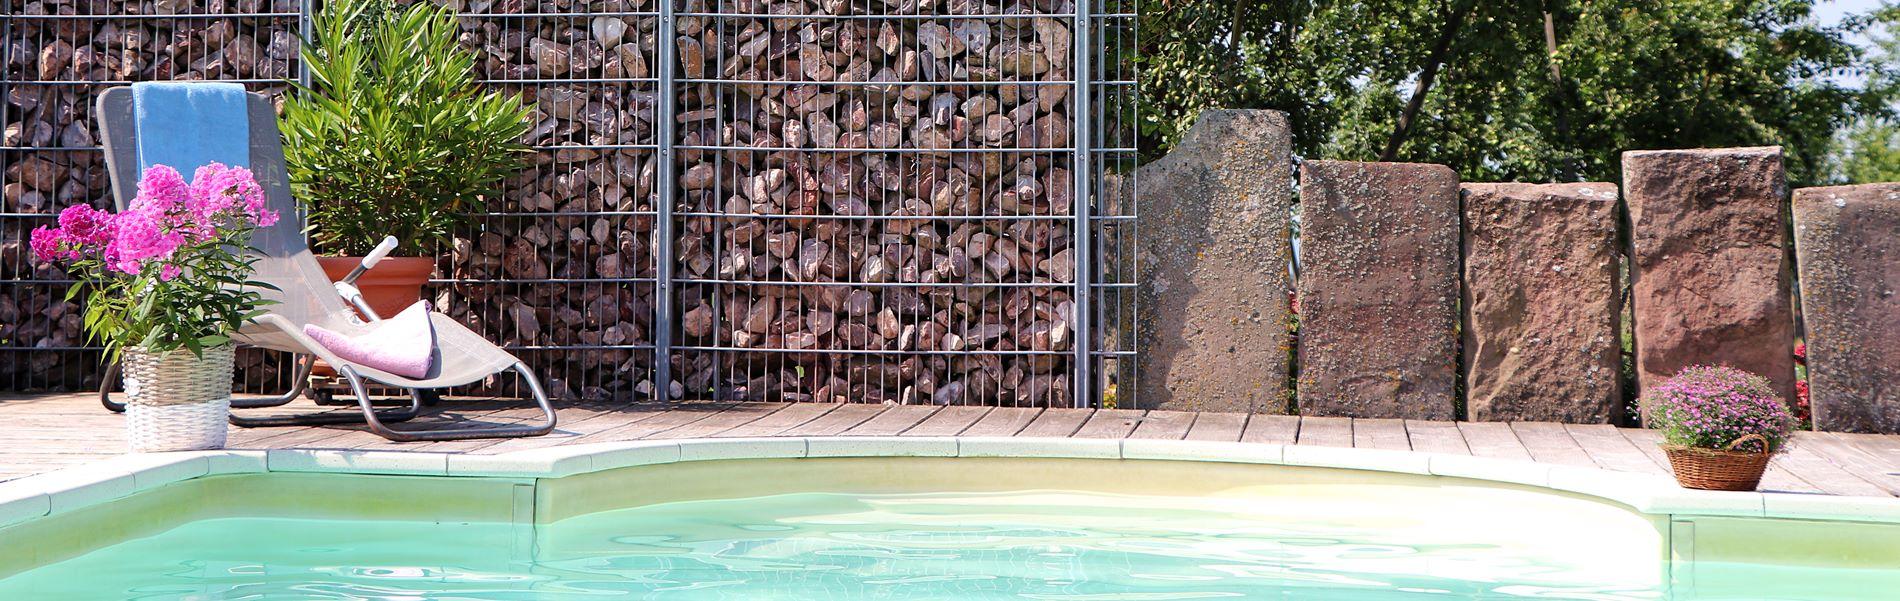 swimmongpool-ferienhof-buehrer